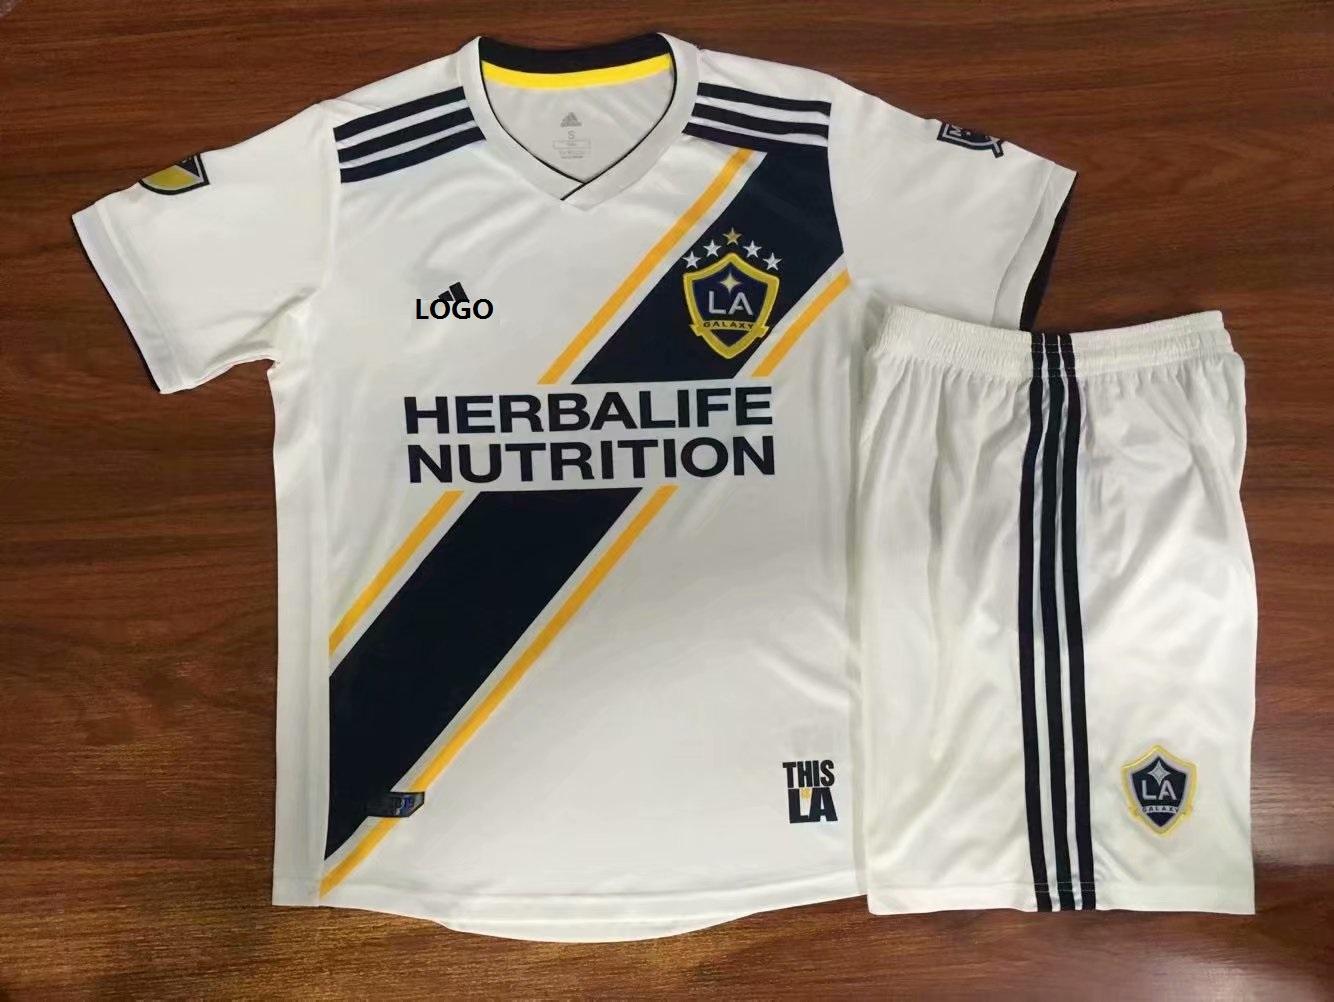 b74d36260ae 2019 -20 Kids LA Galaxy FC Home Soccer Jersey Football Uniforms